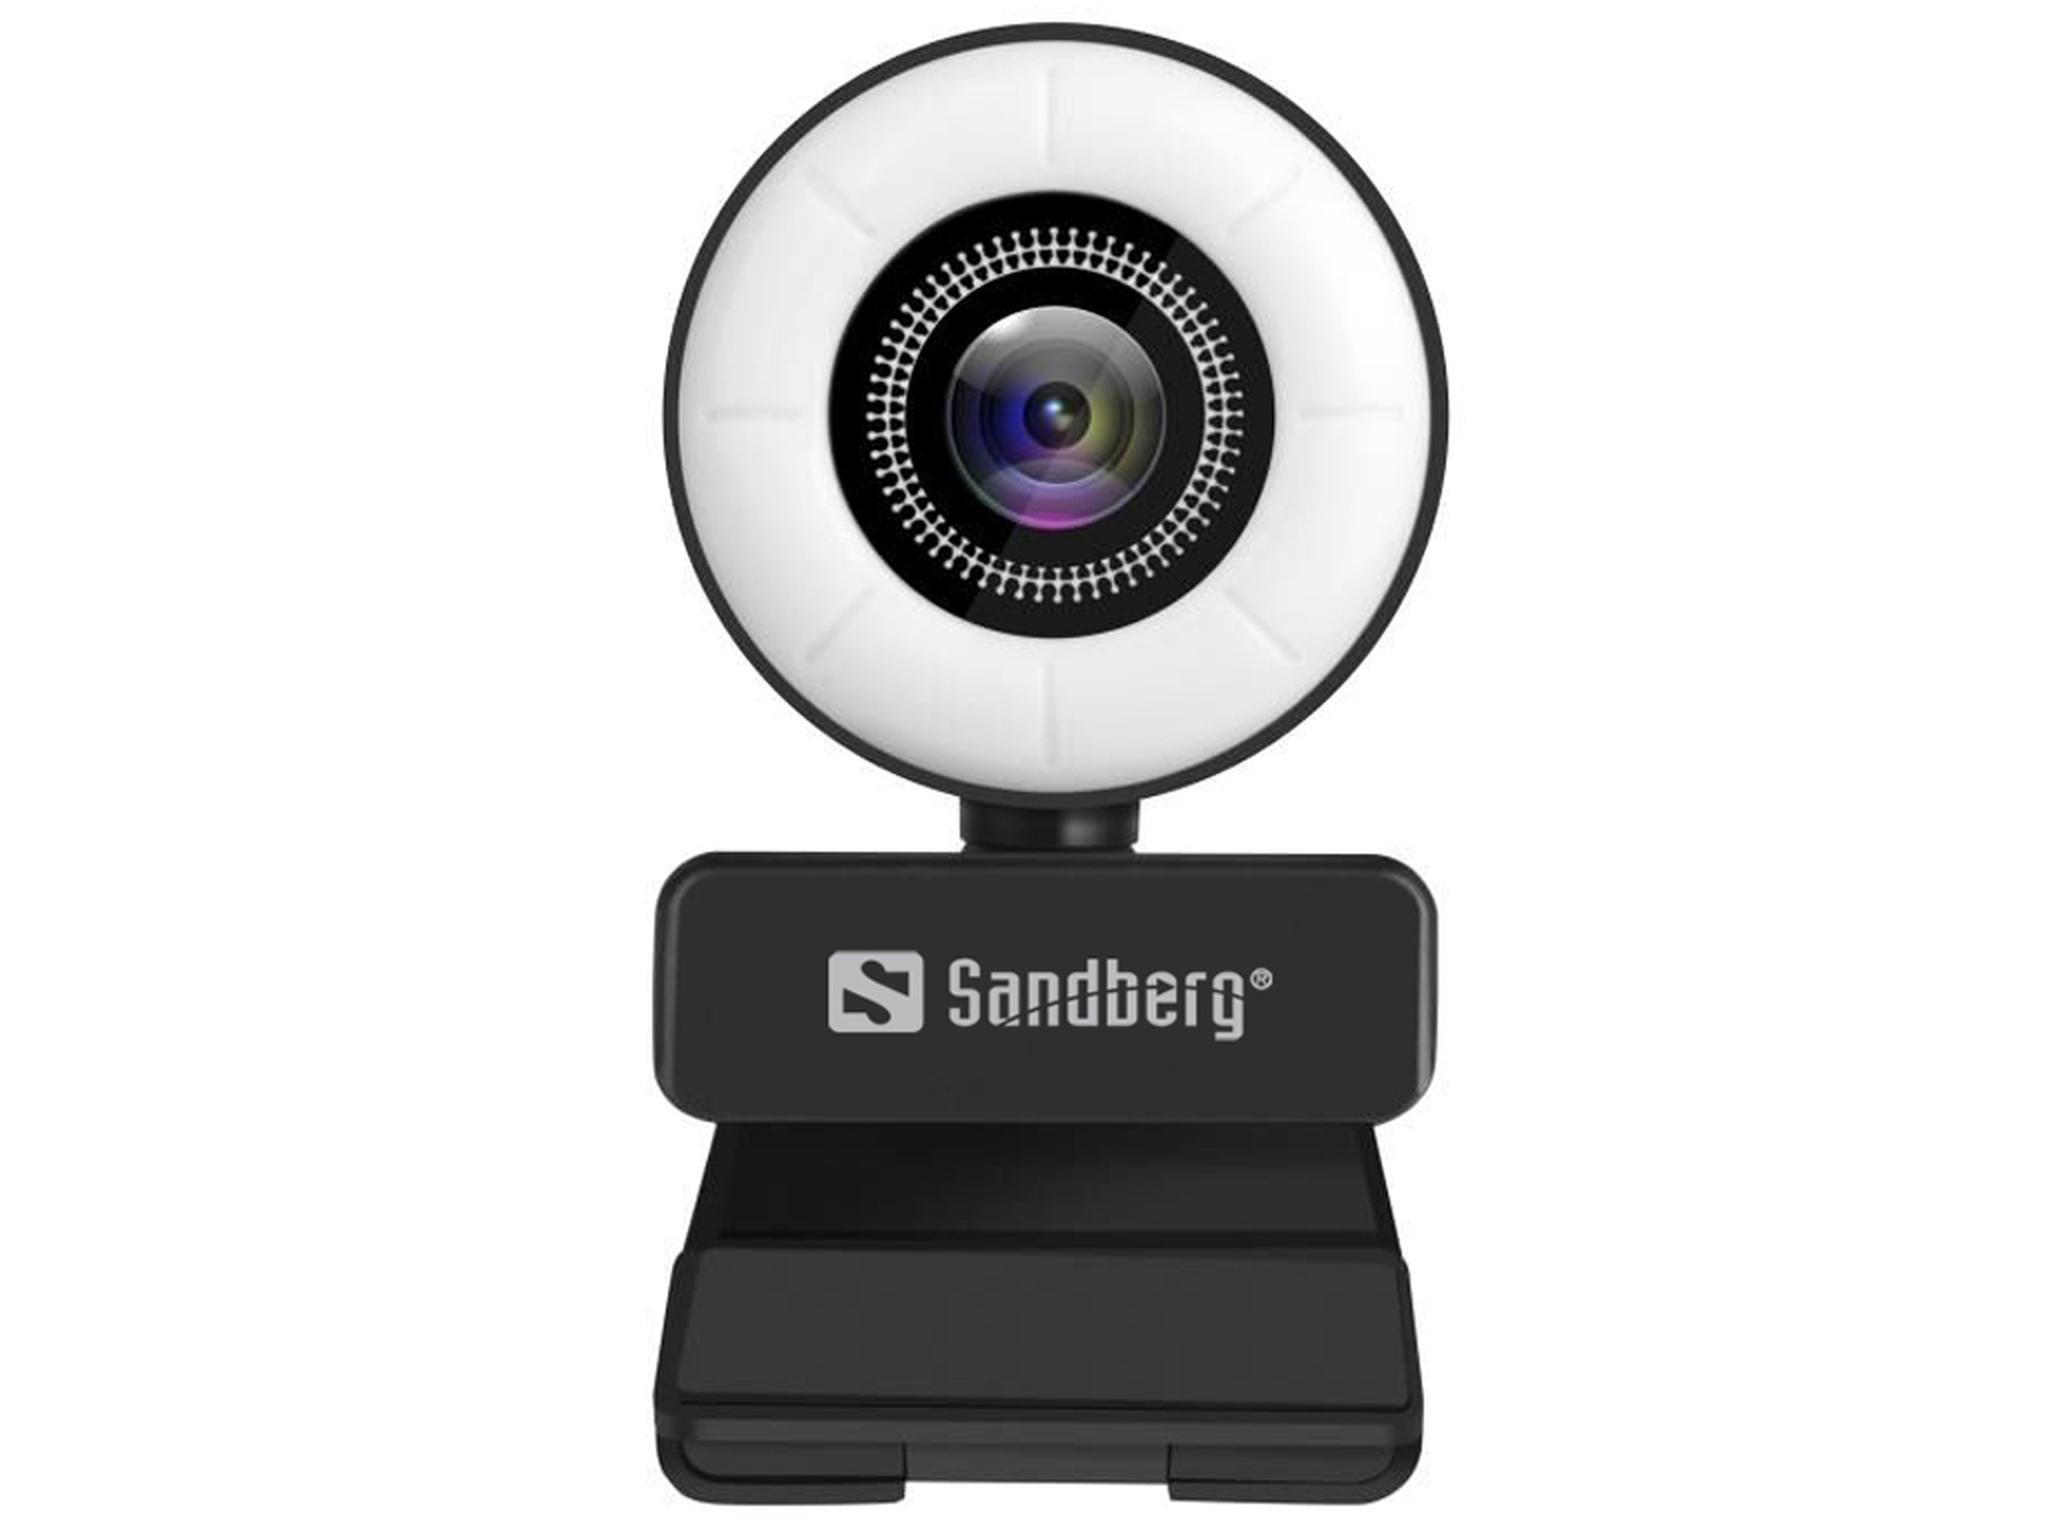 Sandberg Streamer USB Webcam